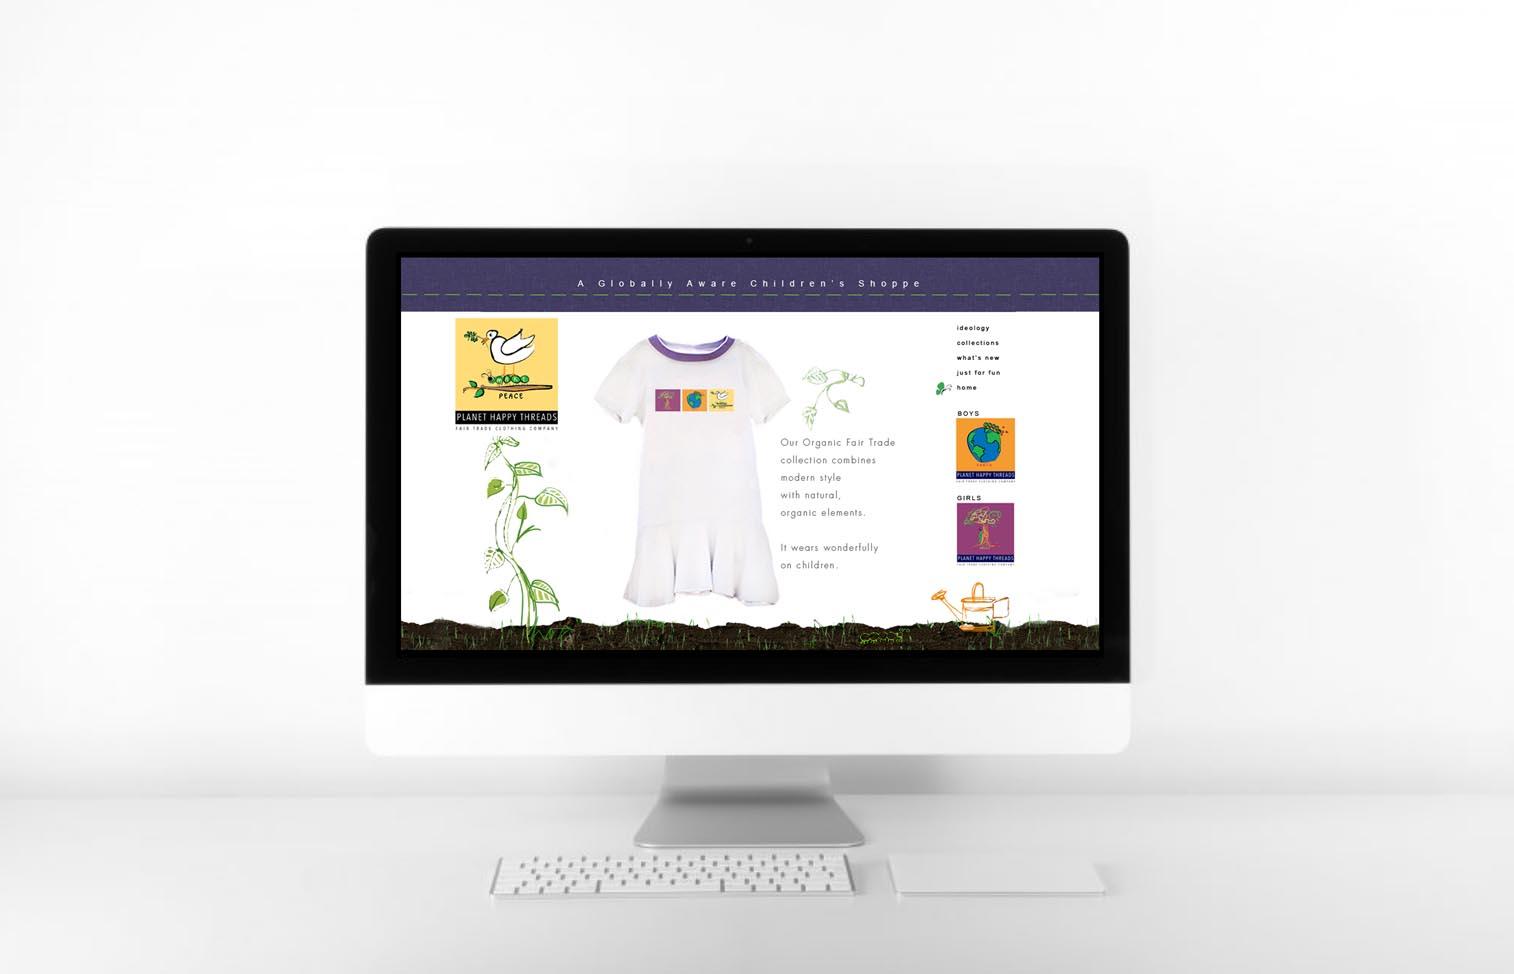 desktop-planet-happy-threads-website-design-company-3